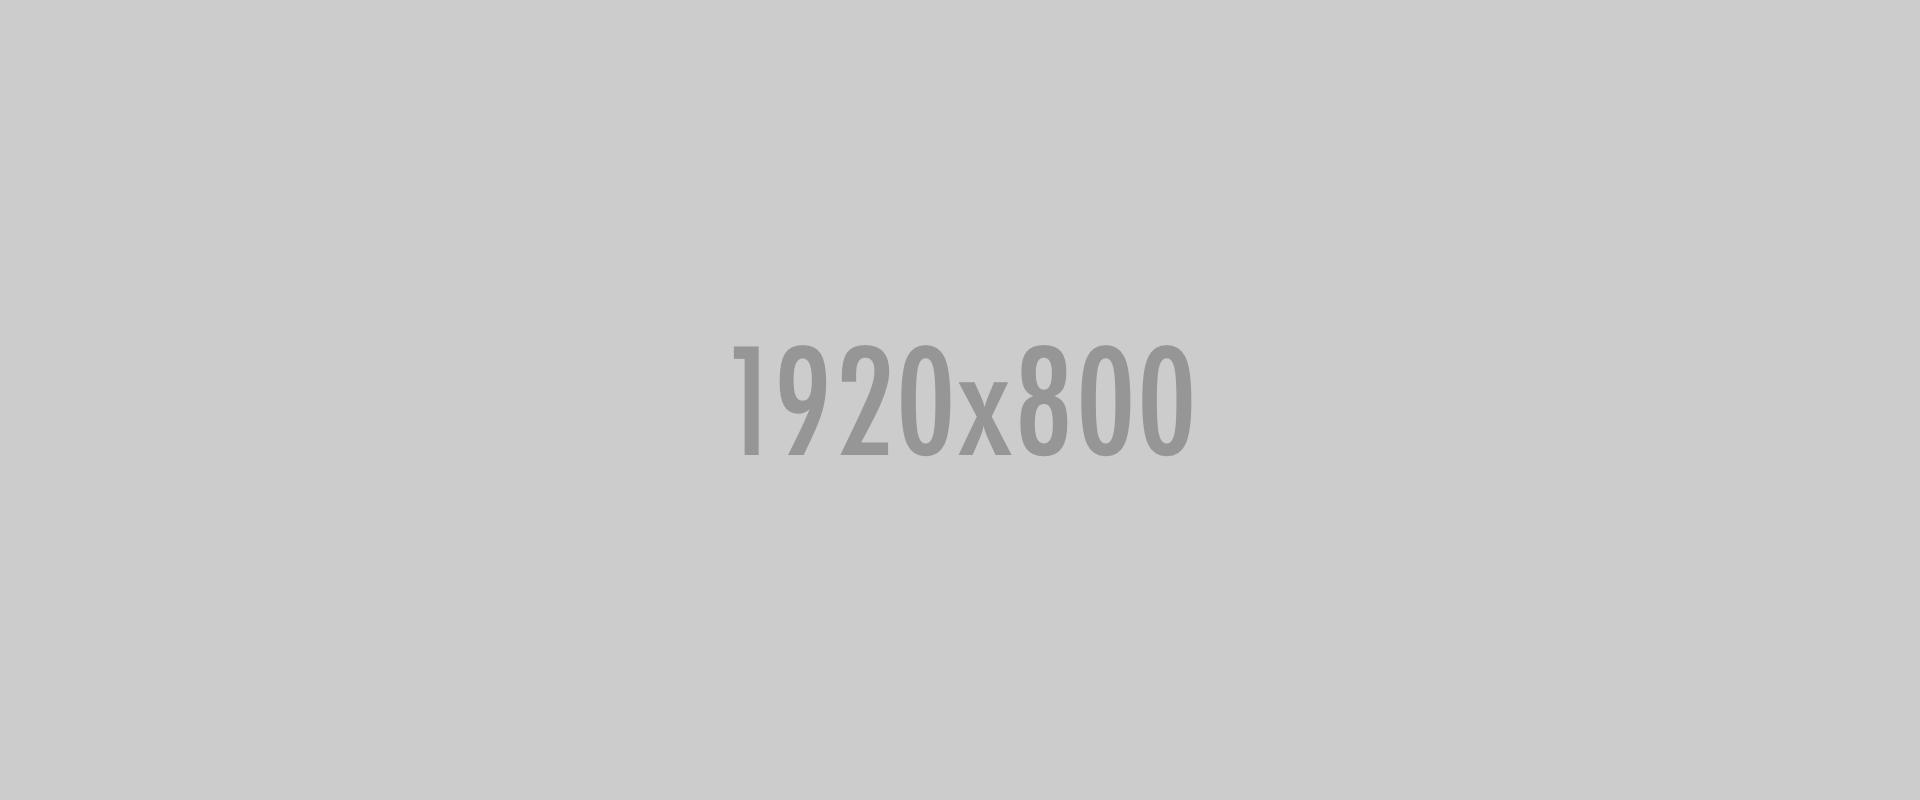 2040 Rue Henri-Cyr, Saint-Hubert, QC J3Y 8X5